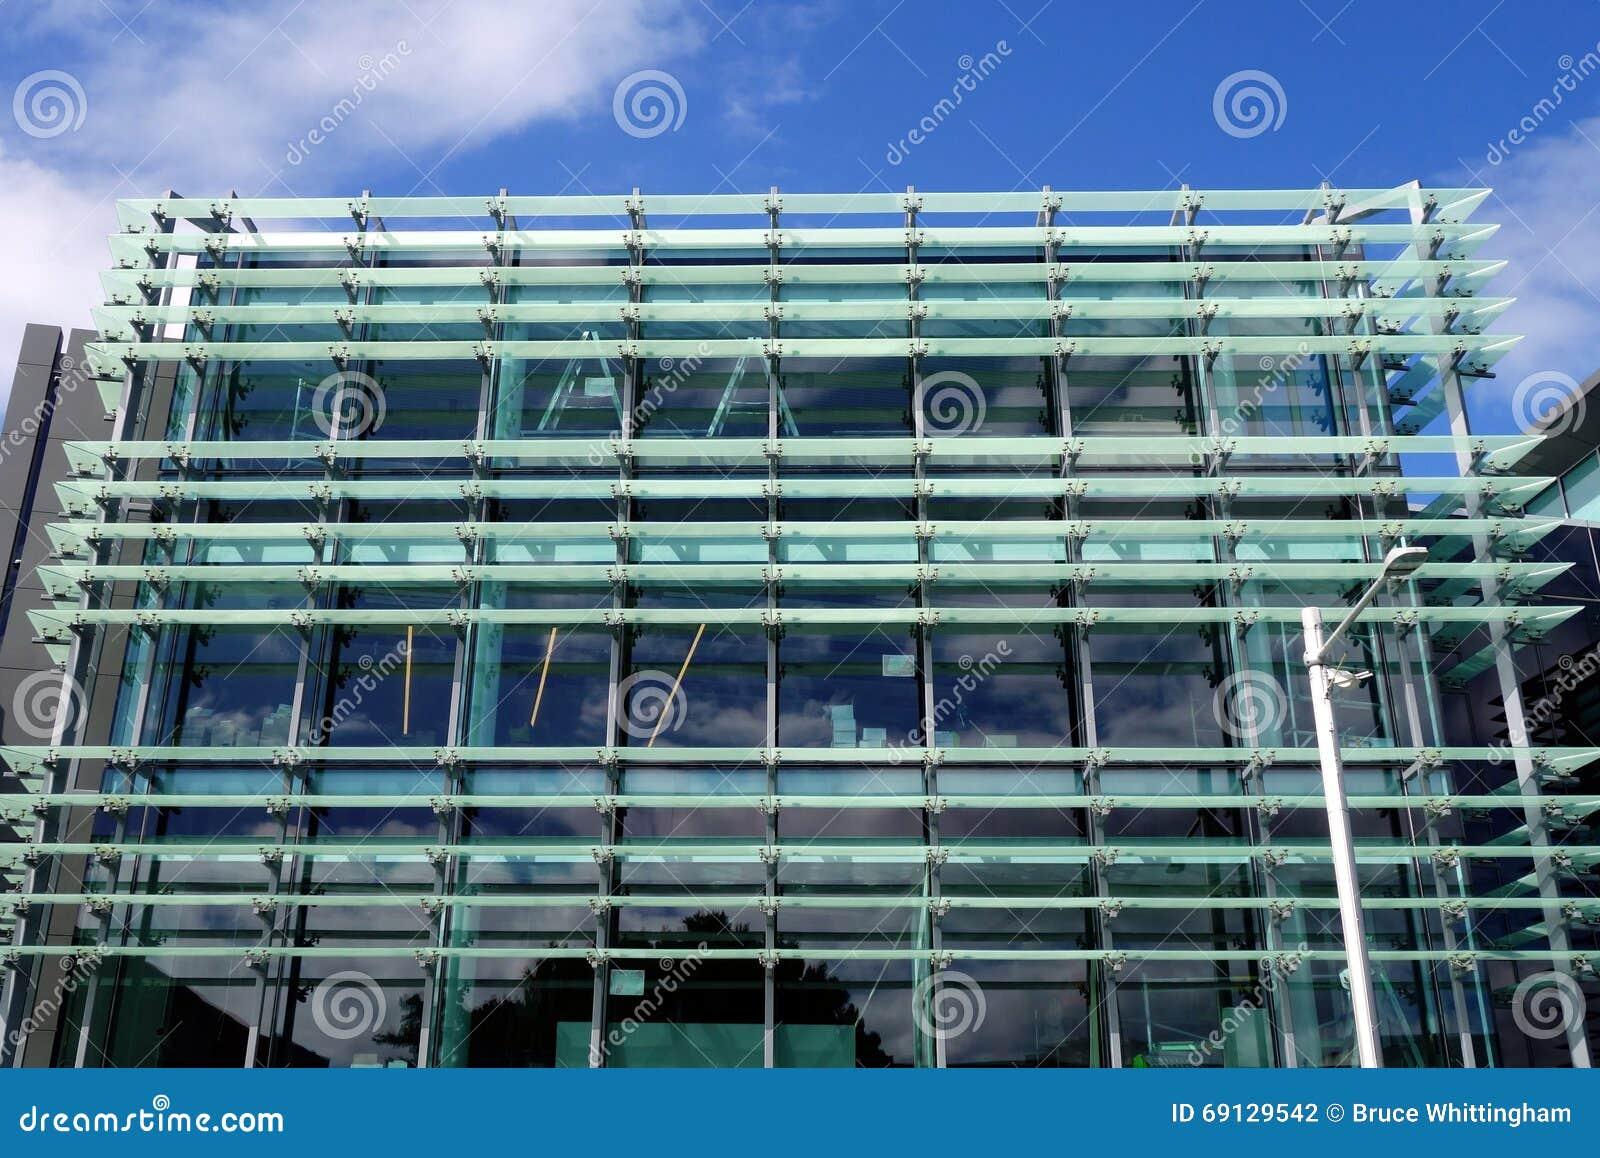 Fachada de cristal constructiva moderna foto de archivo - Fachada de cristal ...